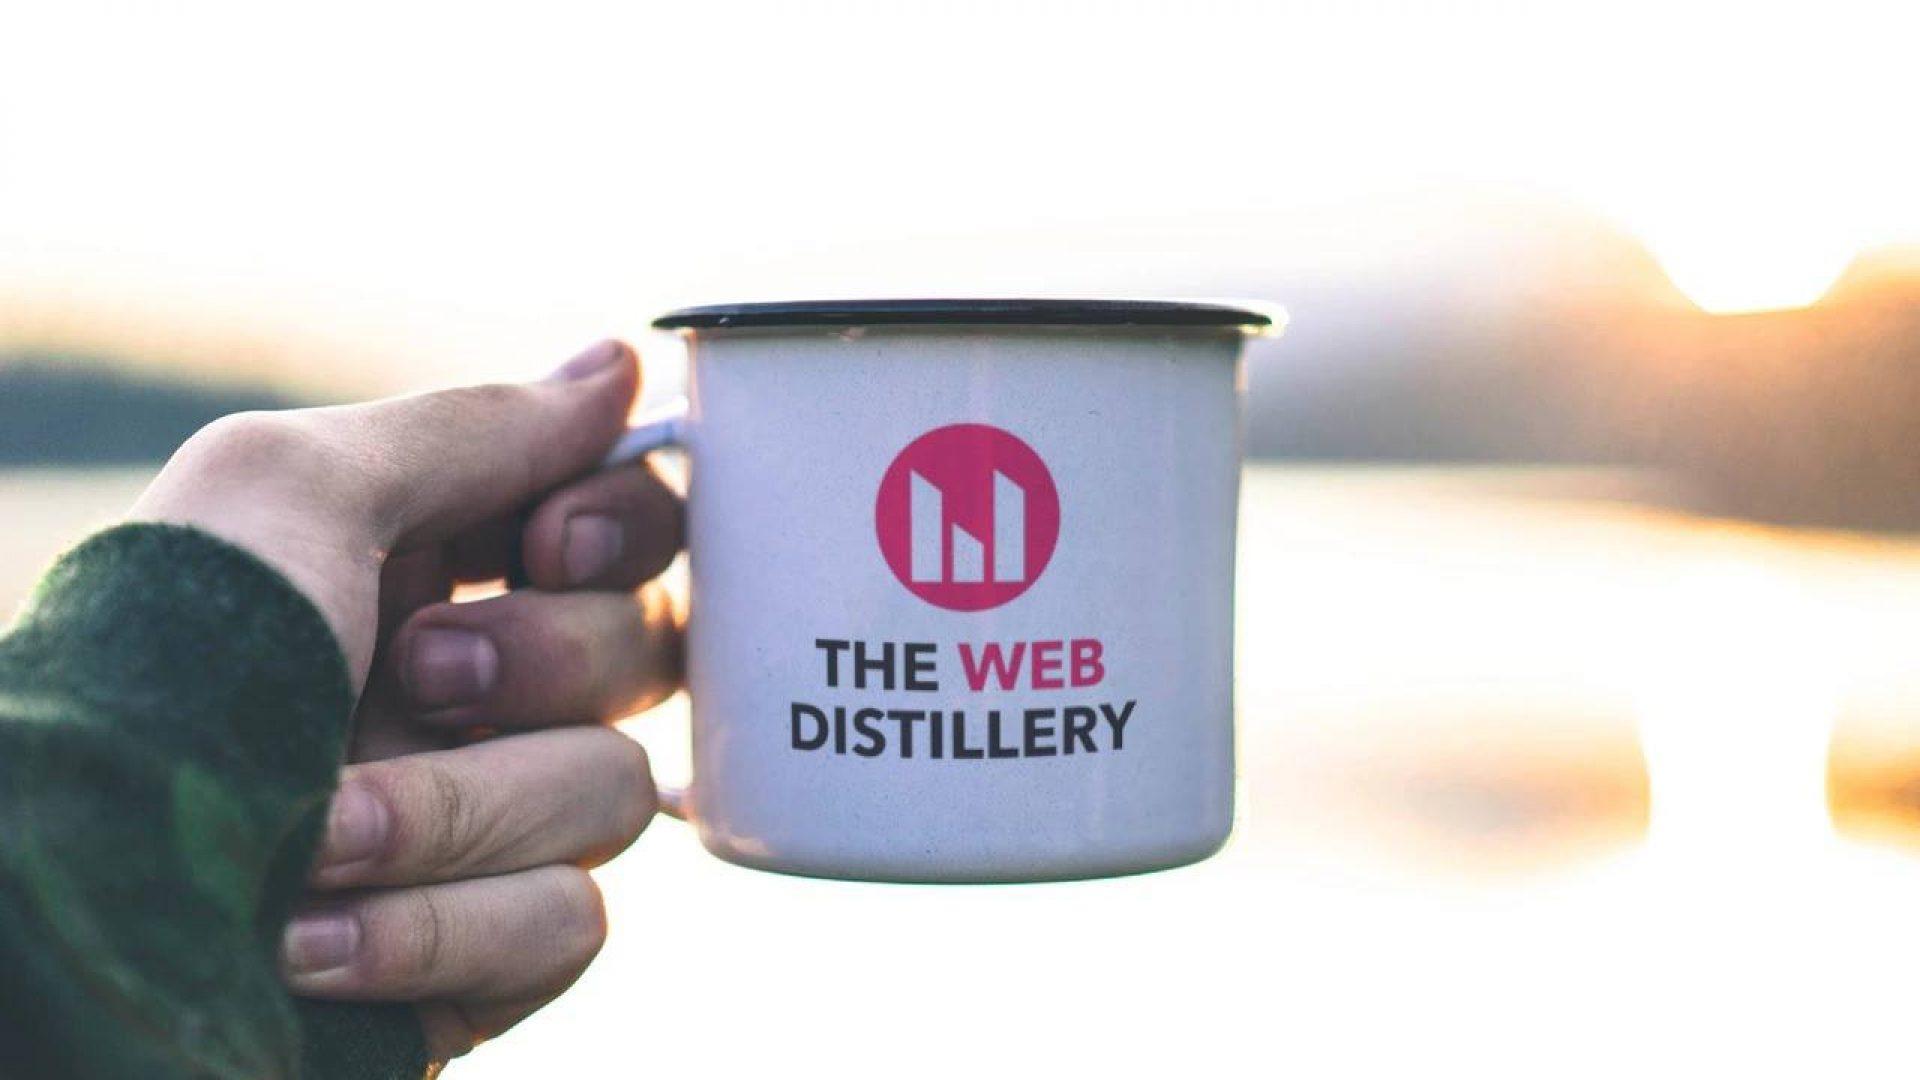 https://thewebdistillery.je/wp-content/uploads/2019/03/WeB-Distillery-Mug-Of-Tea-1920x1080.jpg